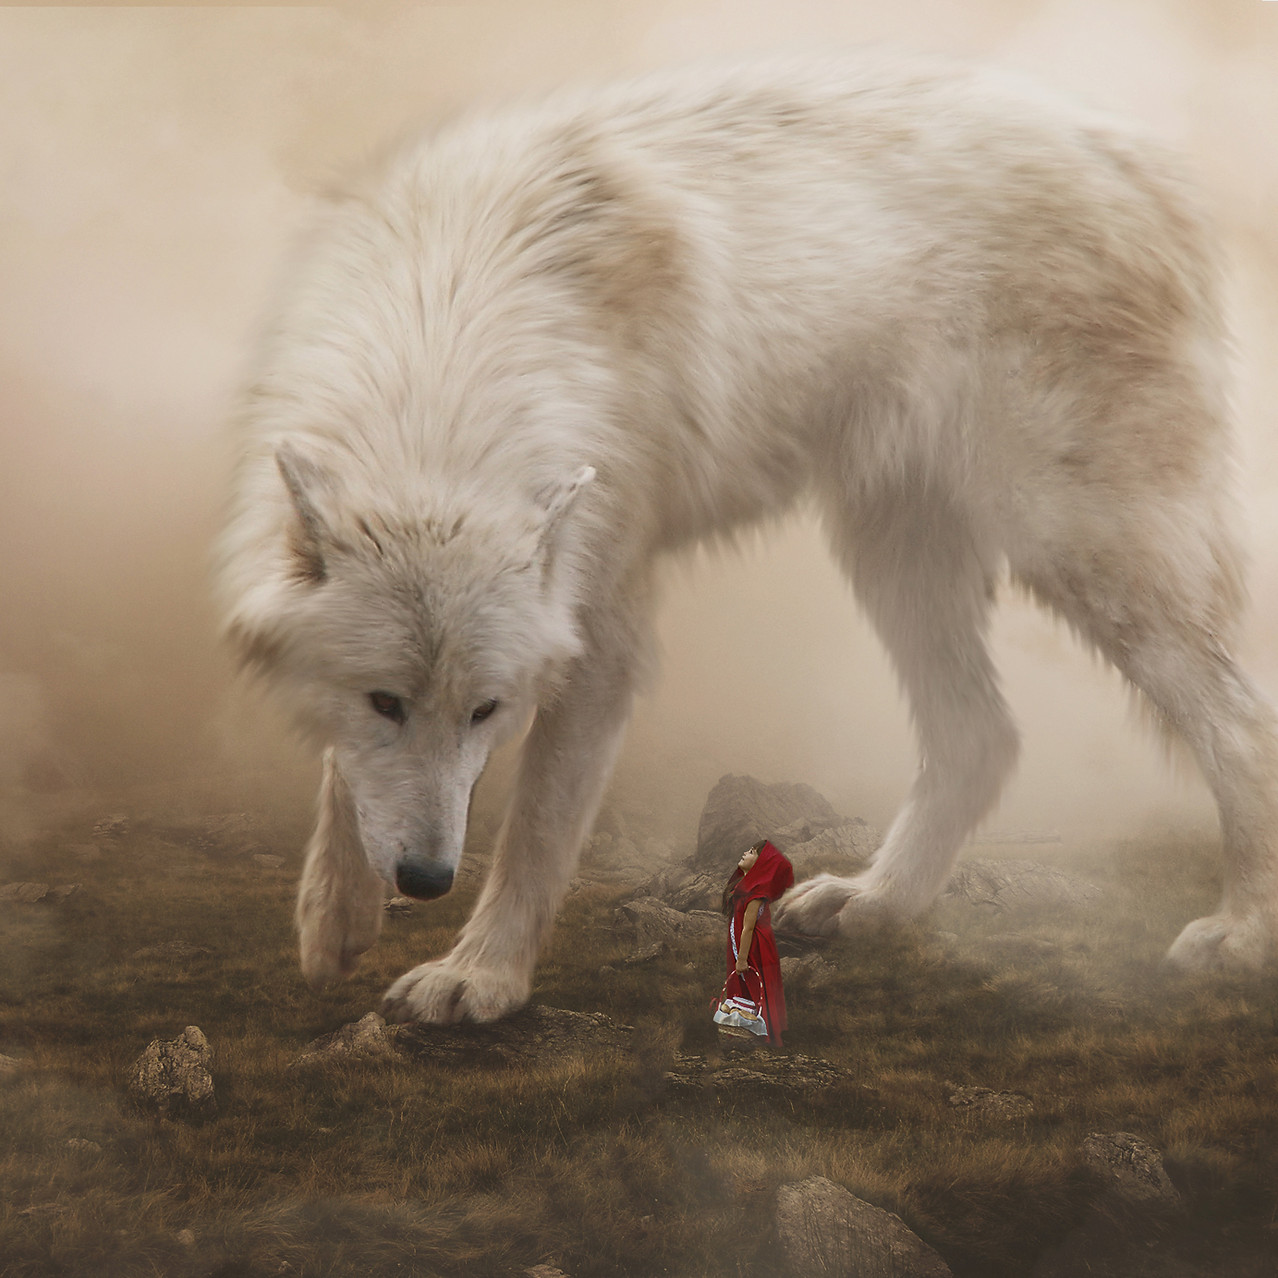 Red R Hood. Creative Children's Photography fantasy photoshoot, Dream Alice Photography & Art, Gold Coast